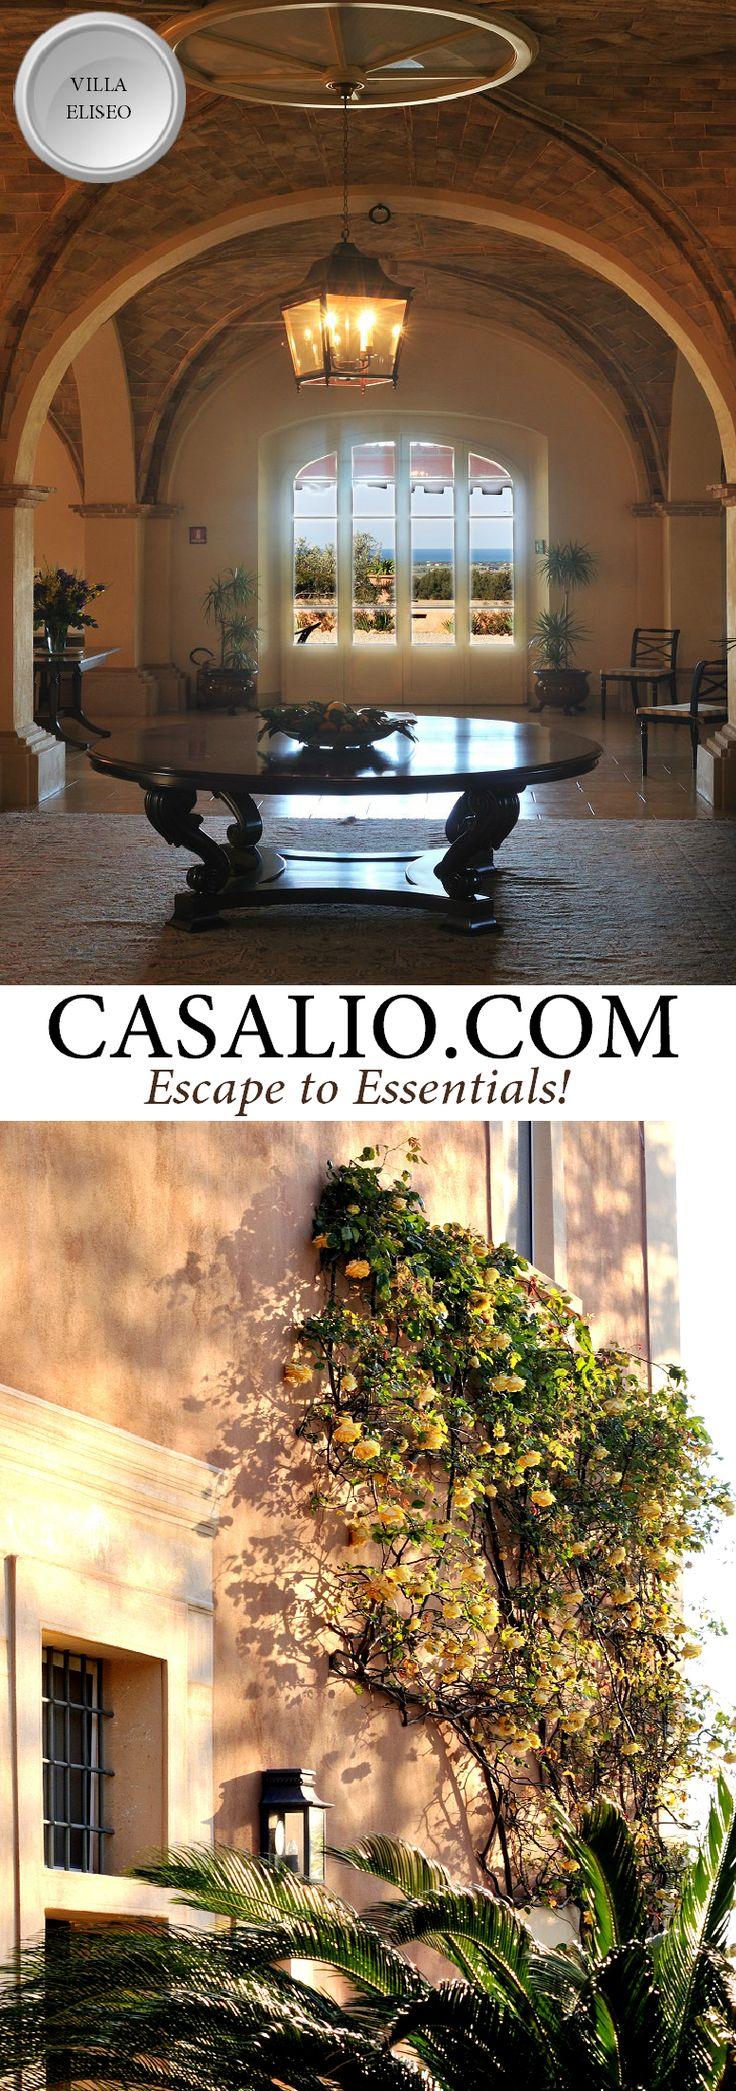 Luxury Villa Rental in Tuscany - Villa Eliseo || Italy - Tuscany || Set among the hills of the Vald Orcia